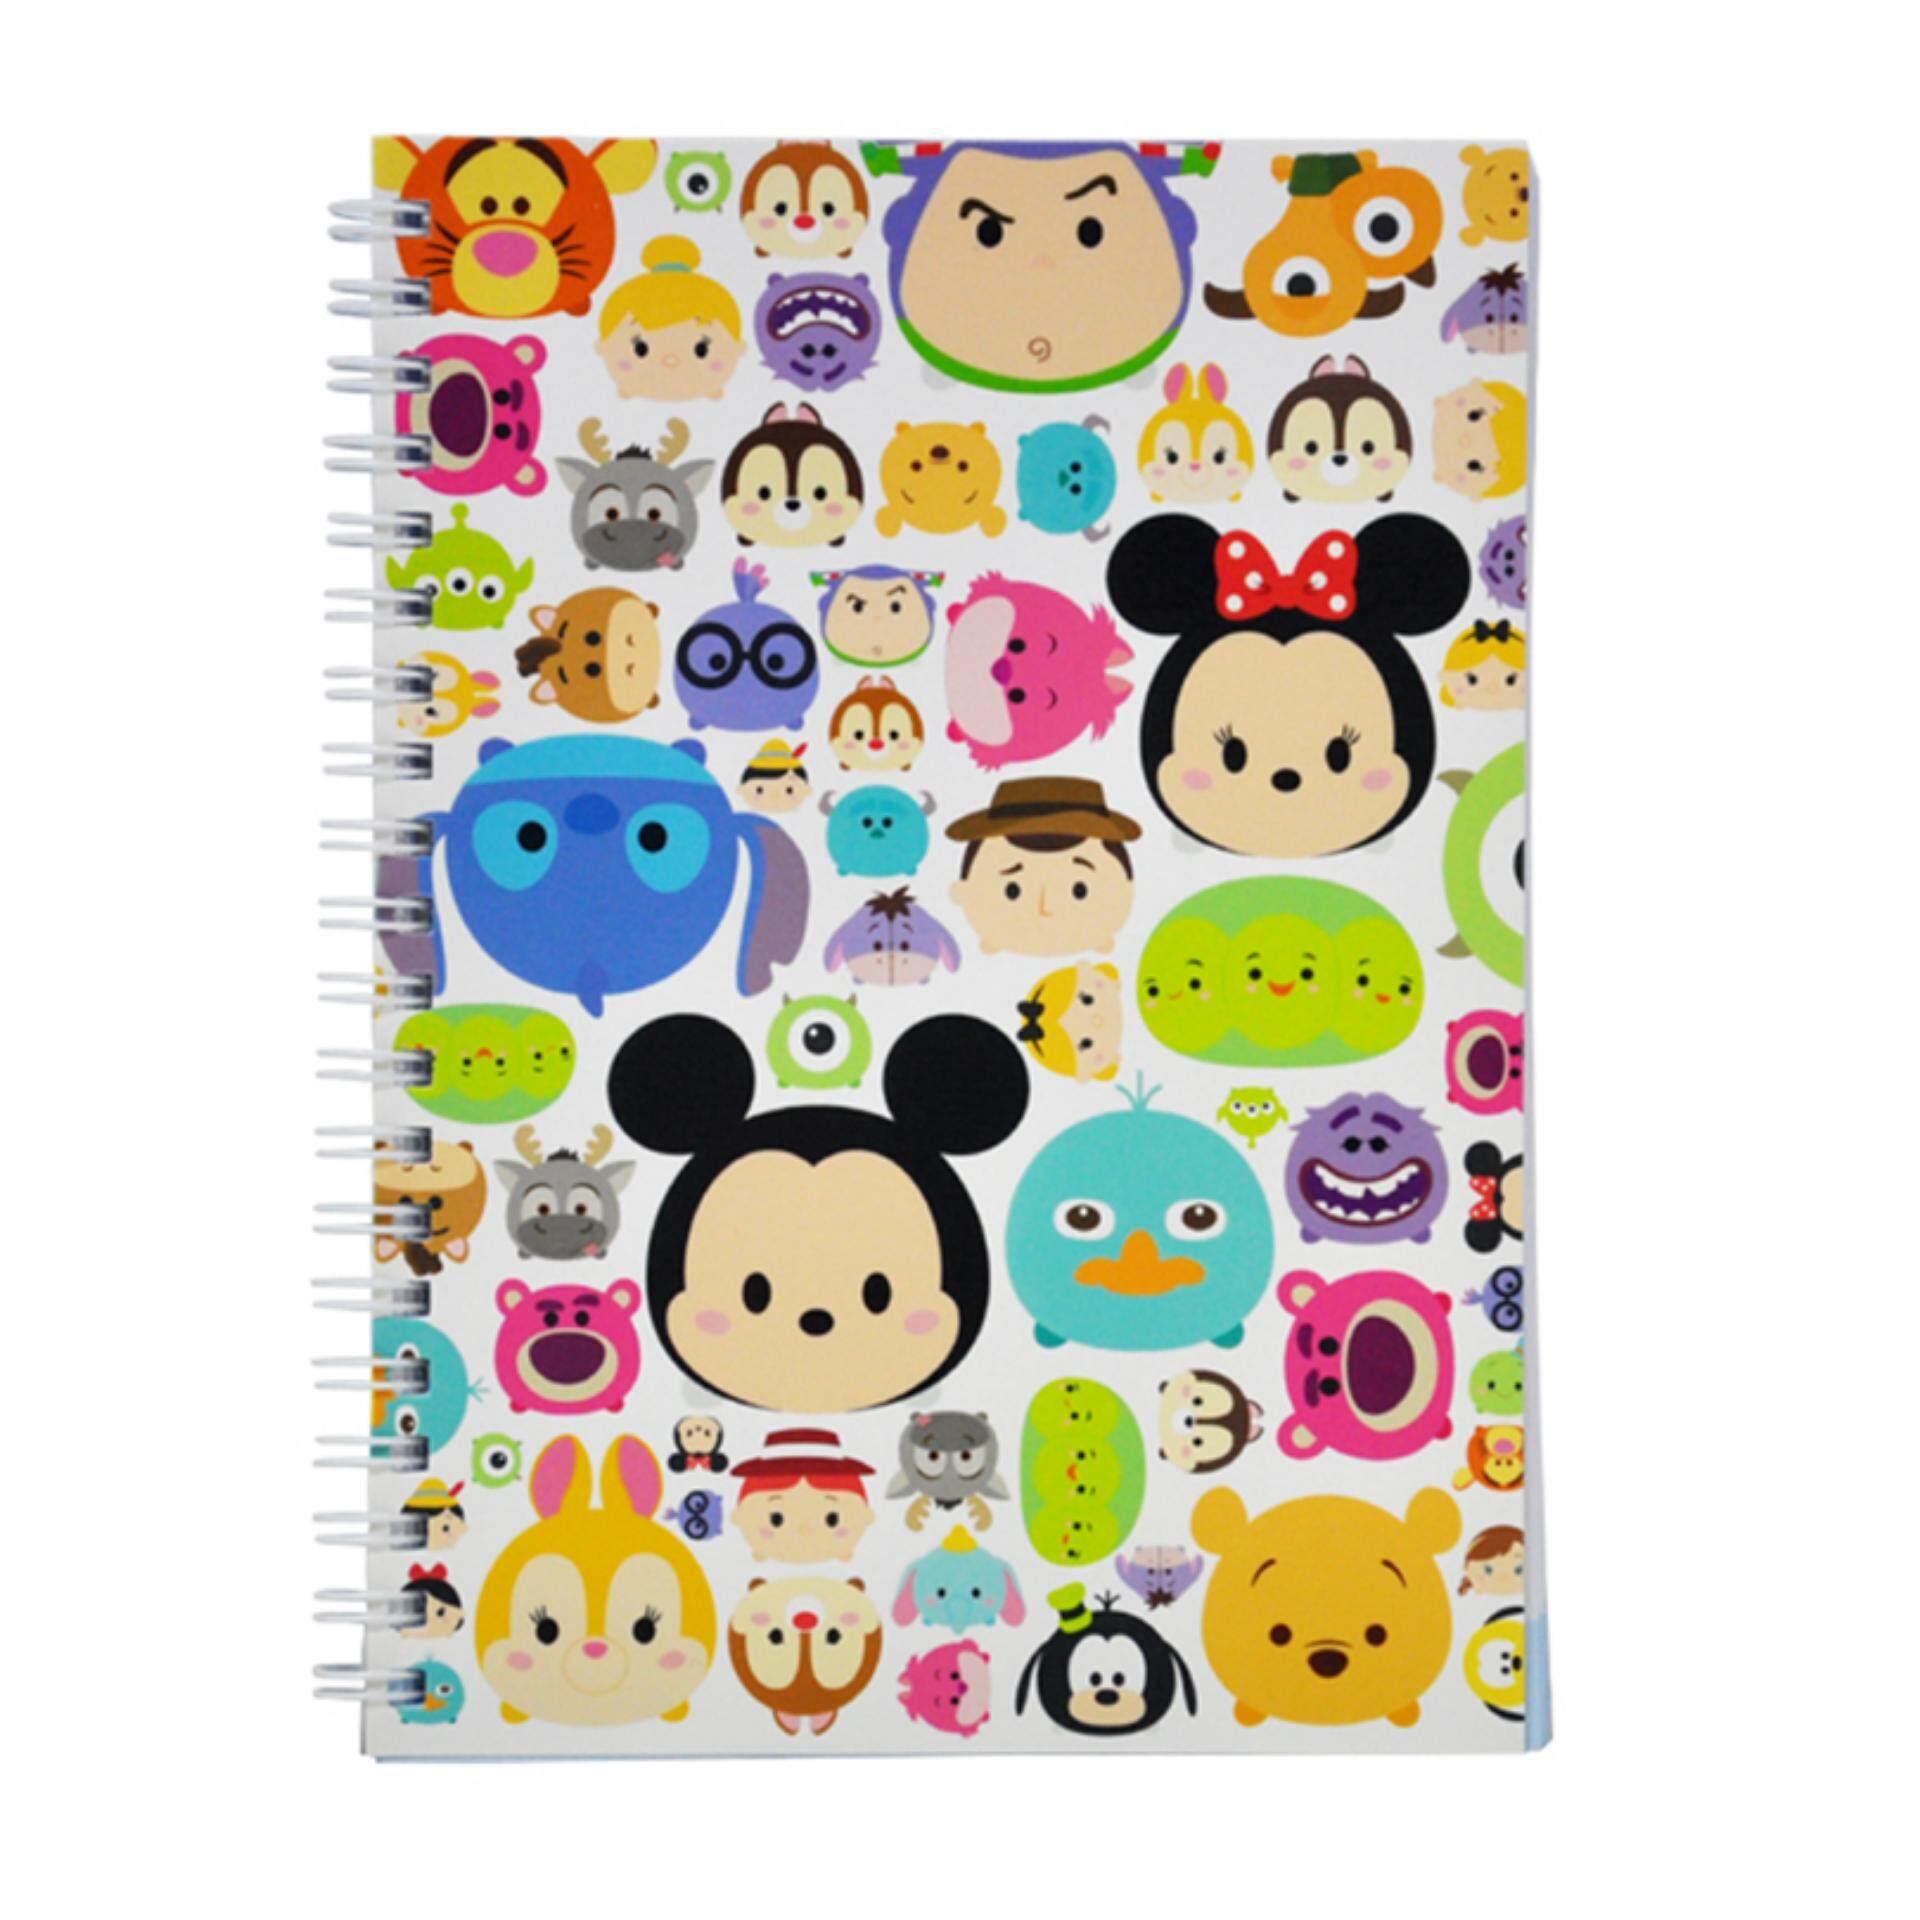 Disney Tsum Tsum NoteBook - Multicolour